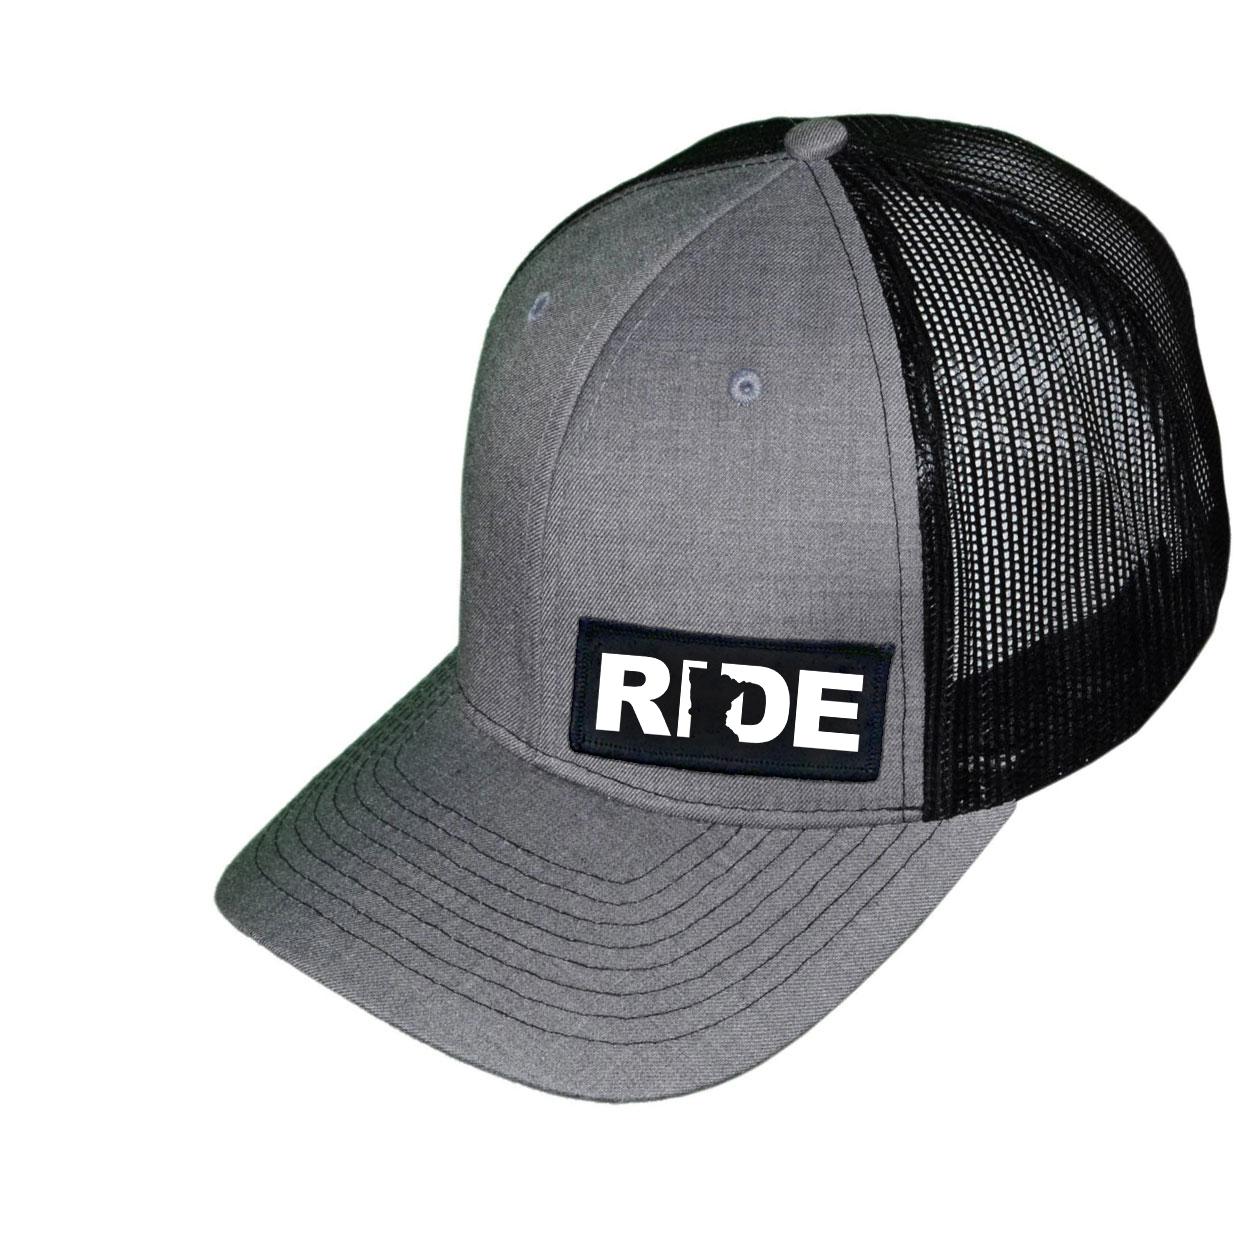 Ride Minnesota Night Out Woven Patch Snapback Trucker Hat Heather Gray/Black (White Logo)